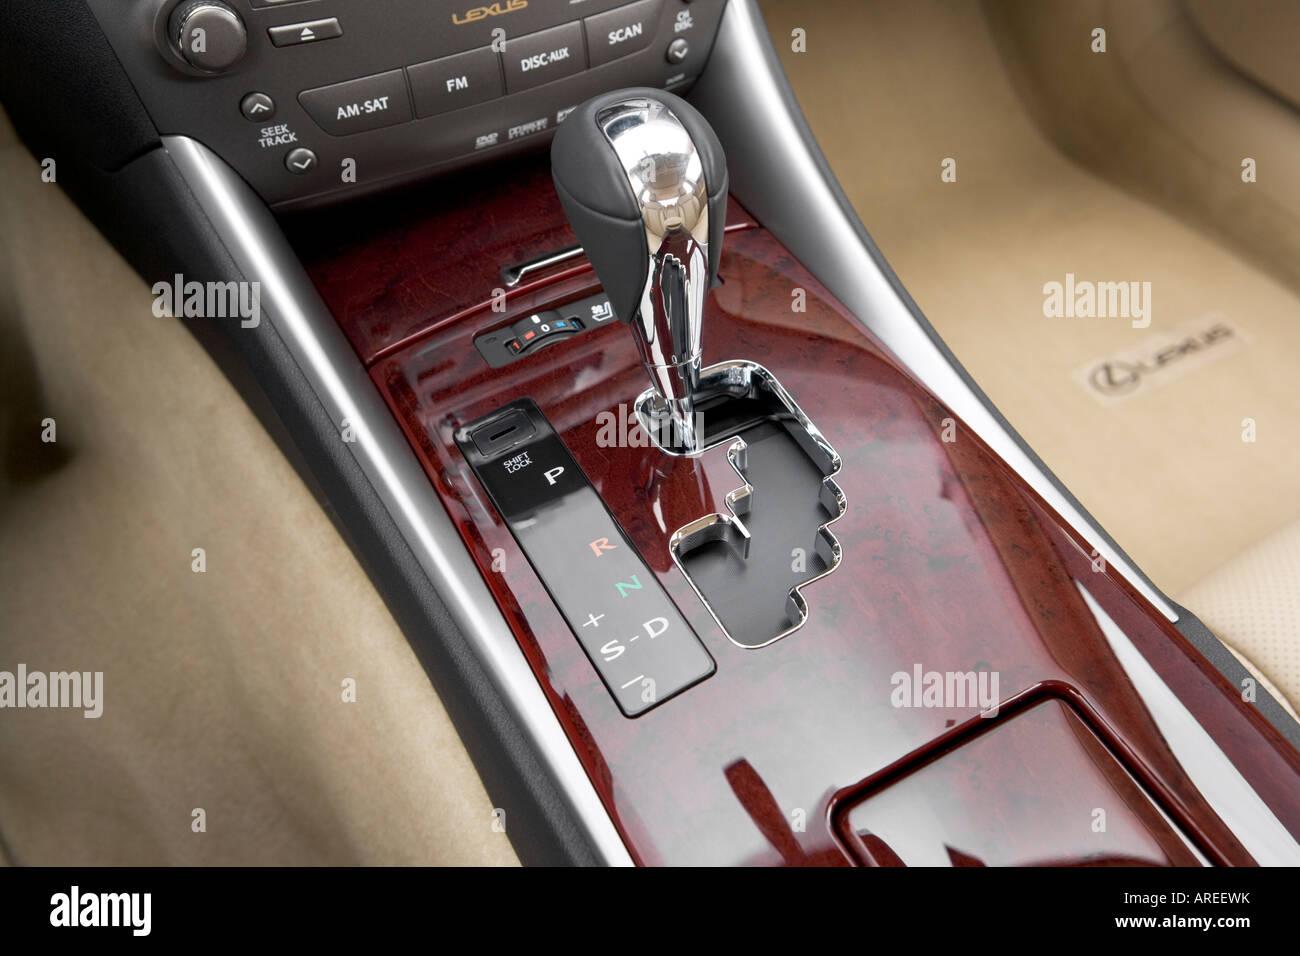 2006 Lexus IS 250 in Green - Gear shifter/center console